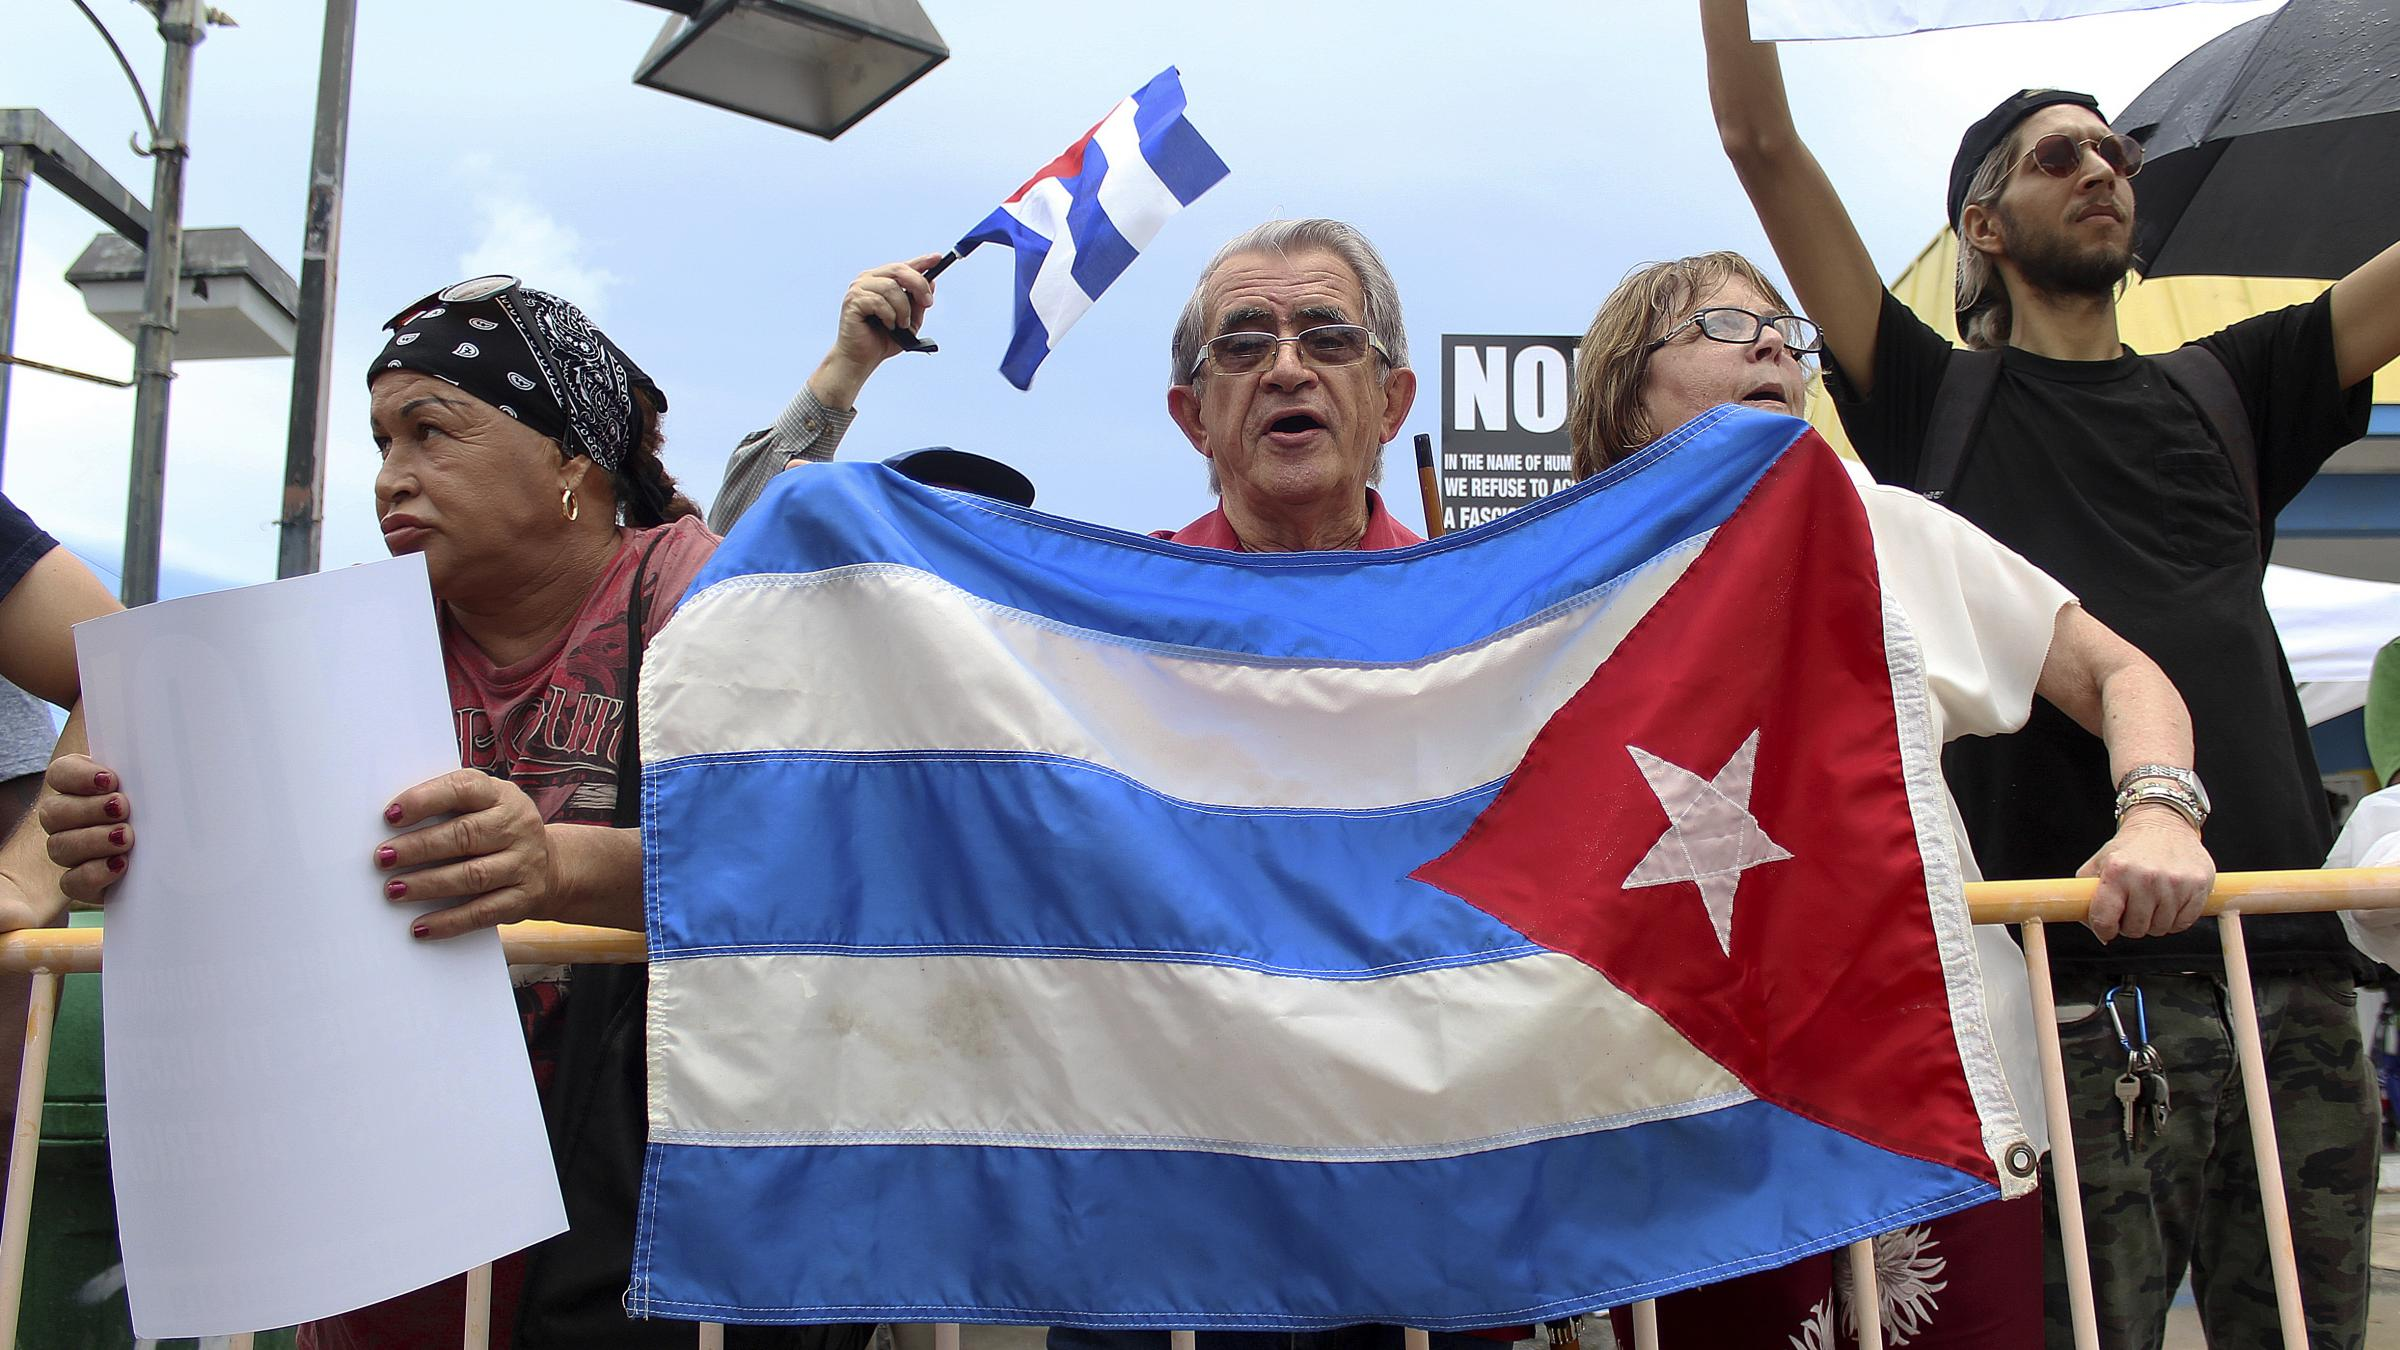 Russia says Trump is using 'Cold War rhetoric' on Cuba